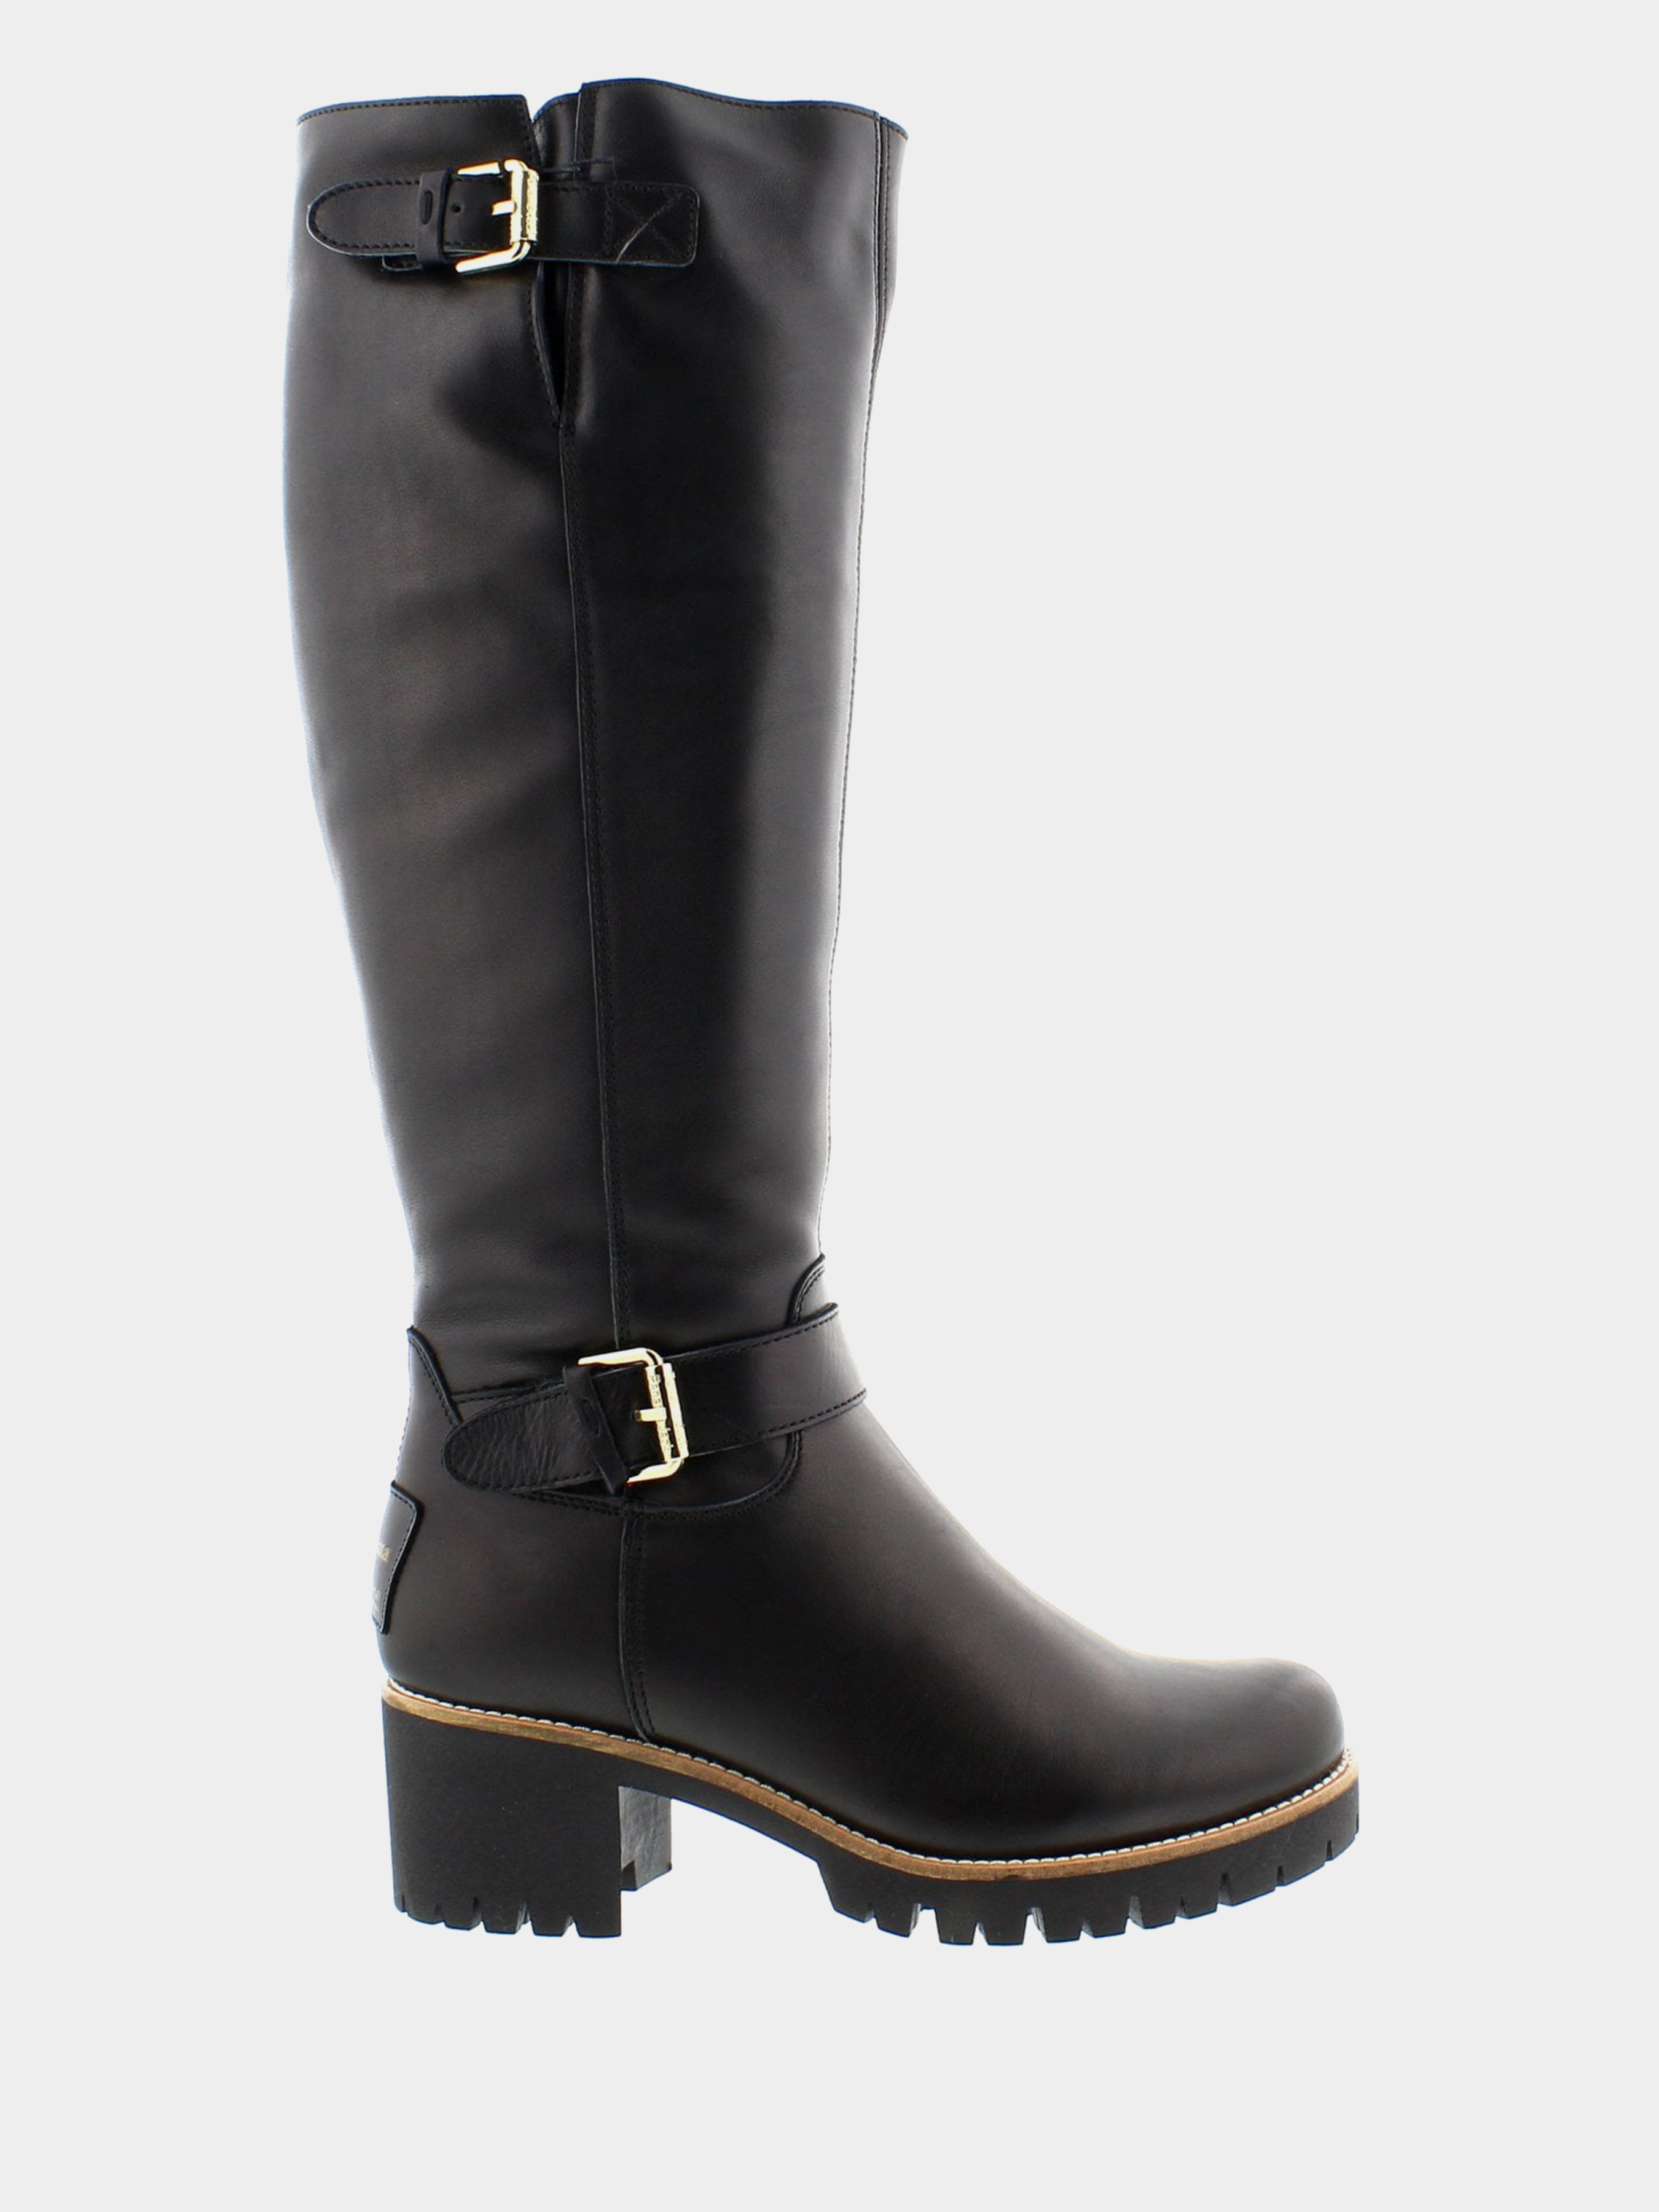 Сапоги для женщин Panama Jack PW194 размеры обуви, 2017